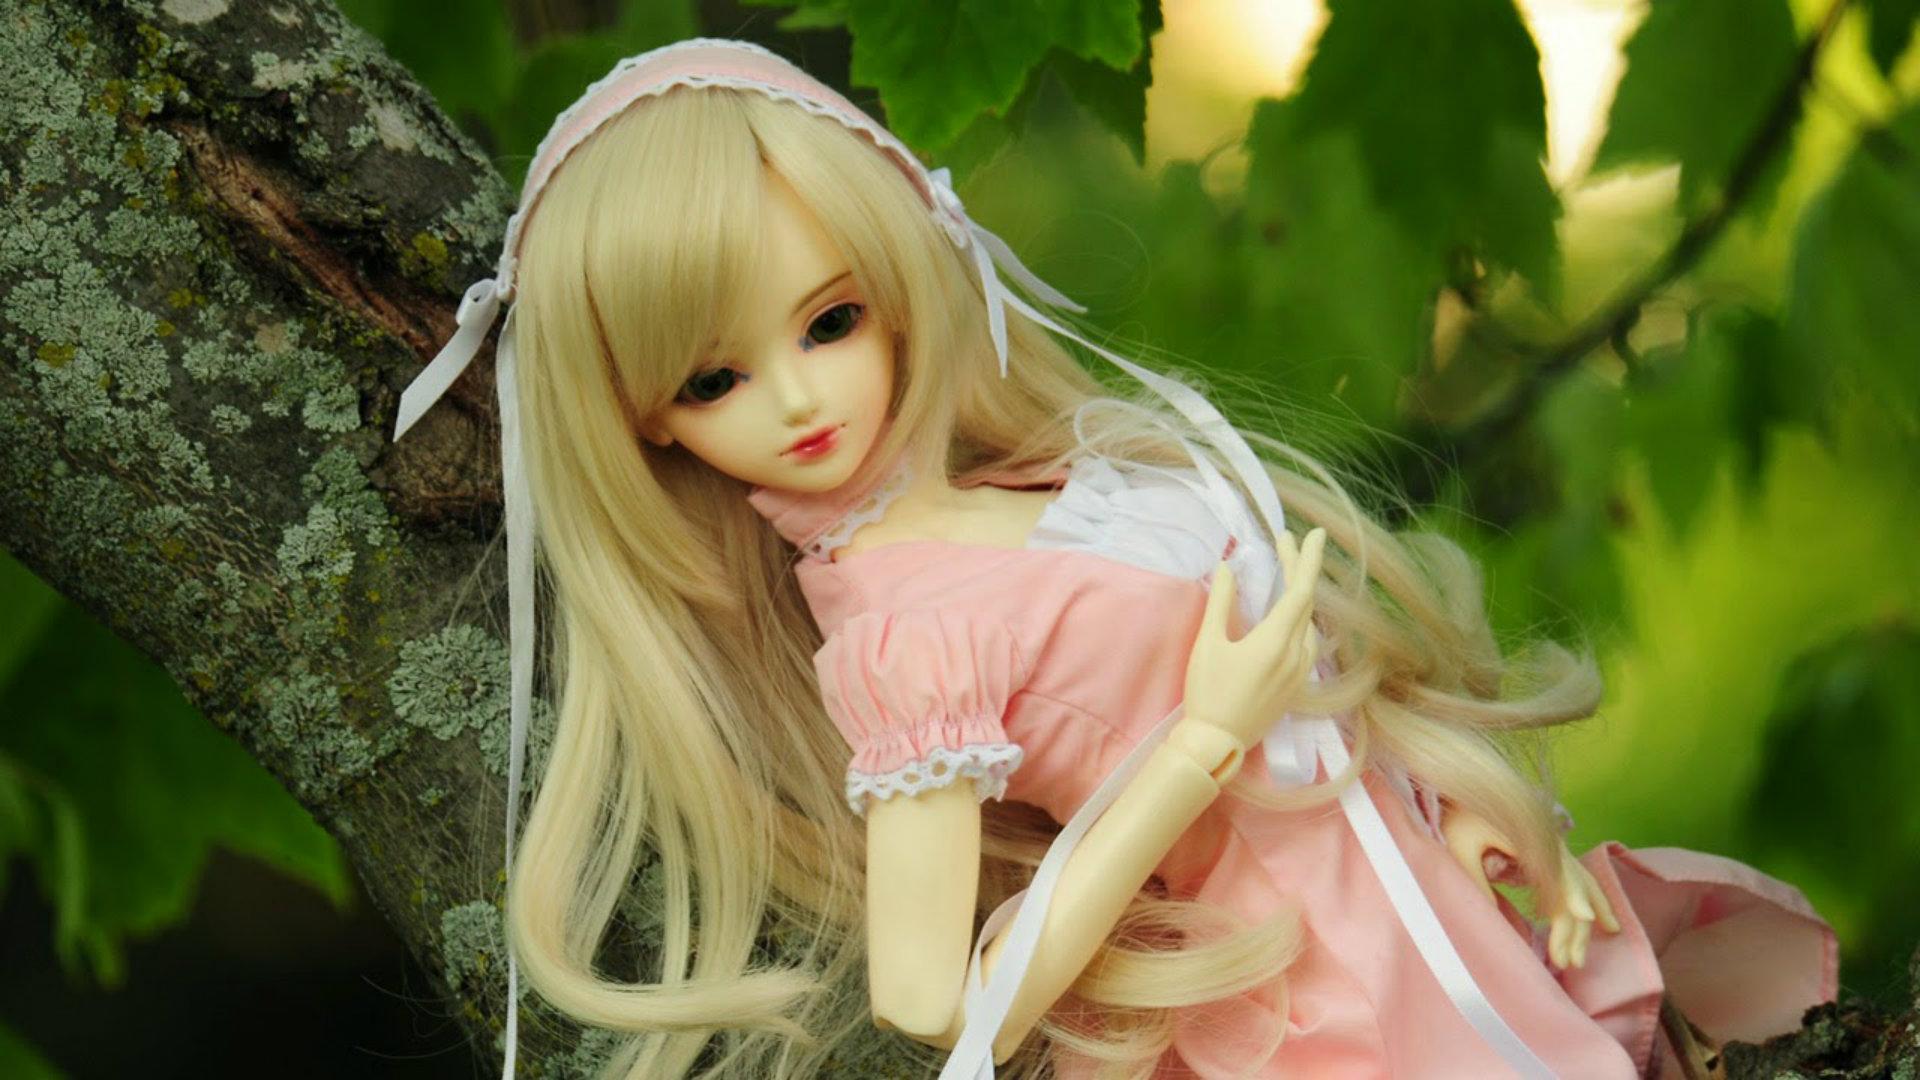 Barbie clipart background Hd barbie barbie doll Beautiful